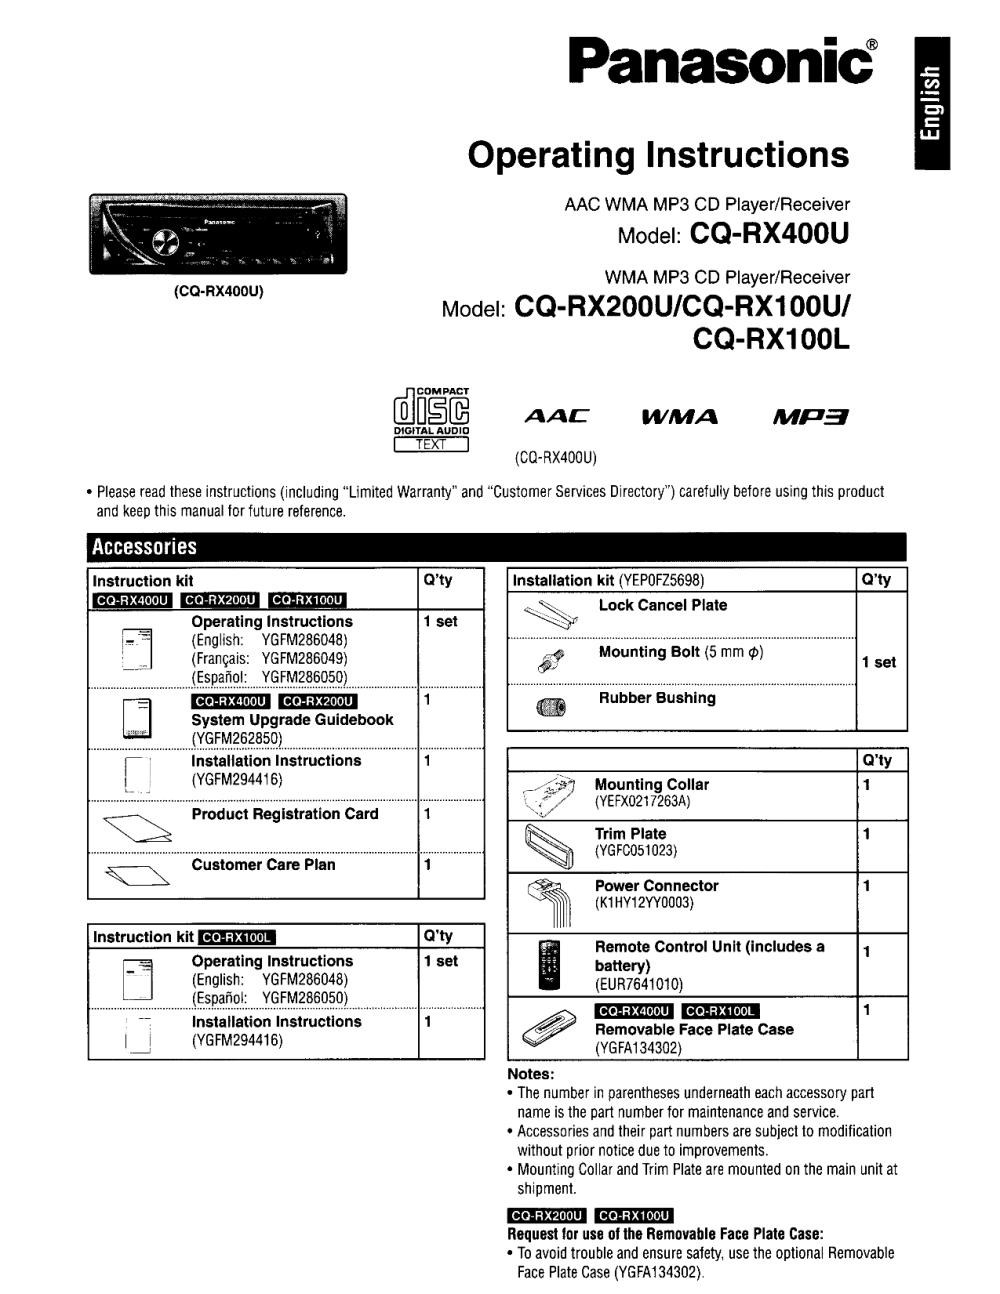 medium resolution of delighted panasonic cq c7301u wiring diagram images the best rx400 panasonic cq c7301u wiring diagram